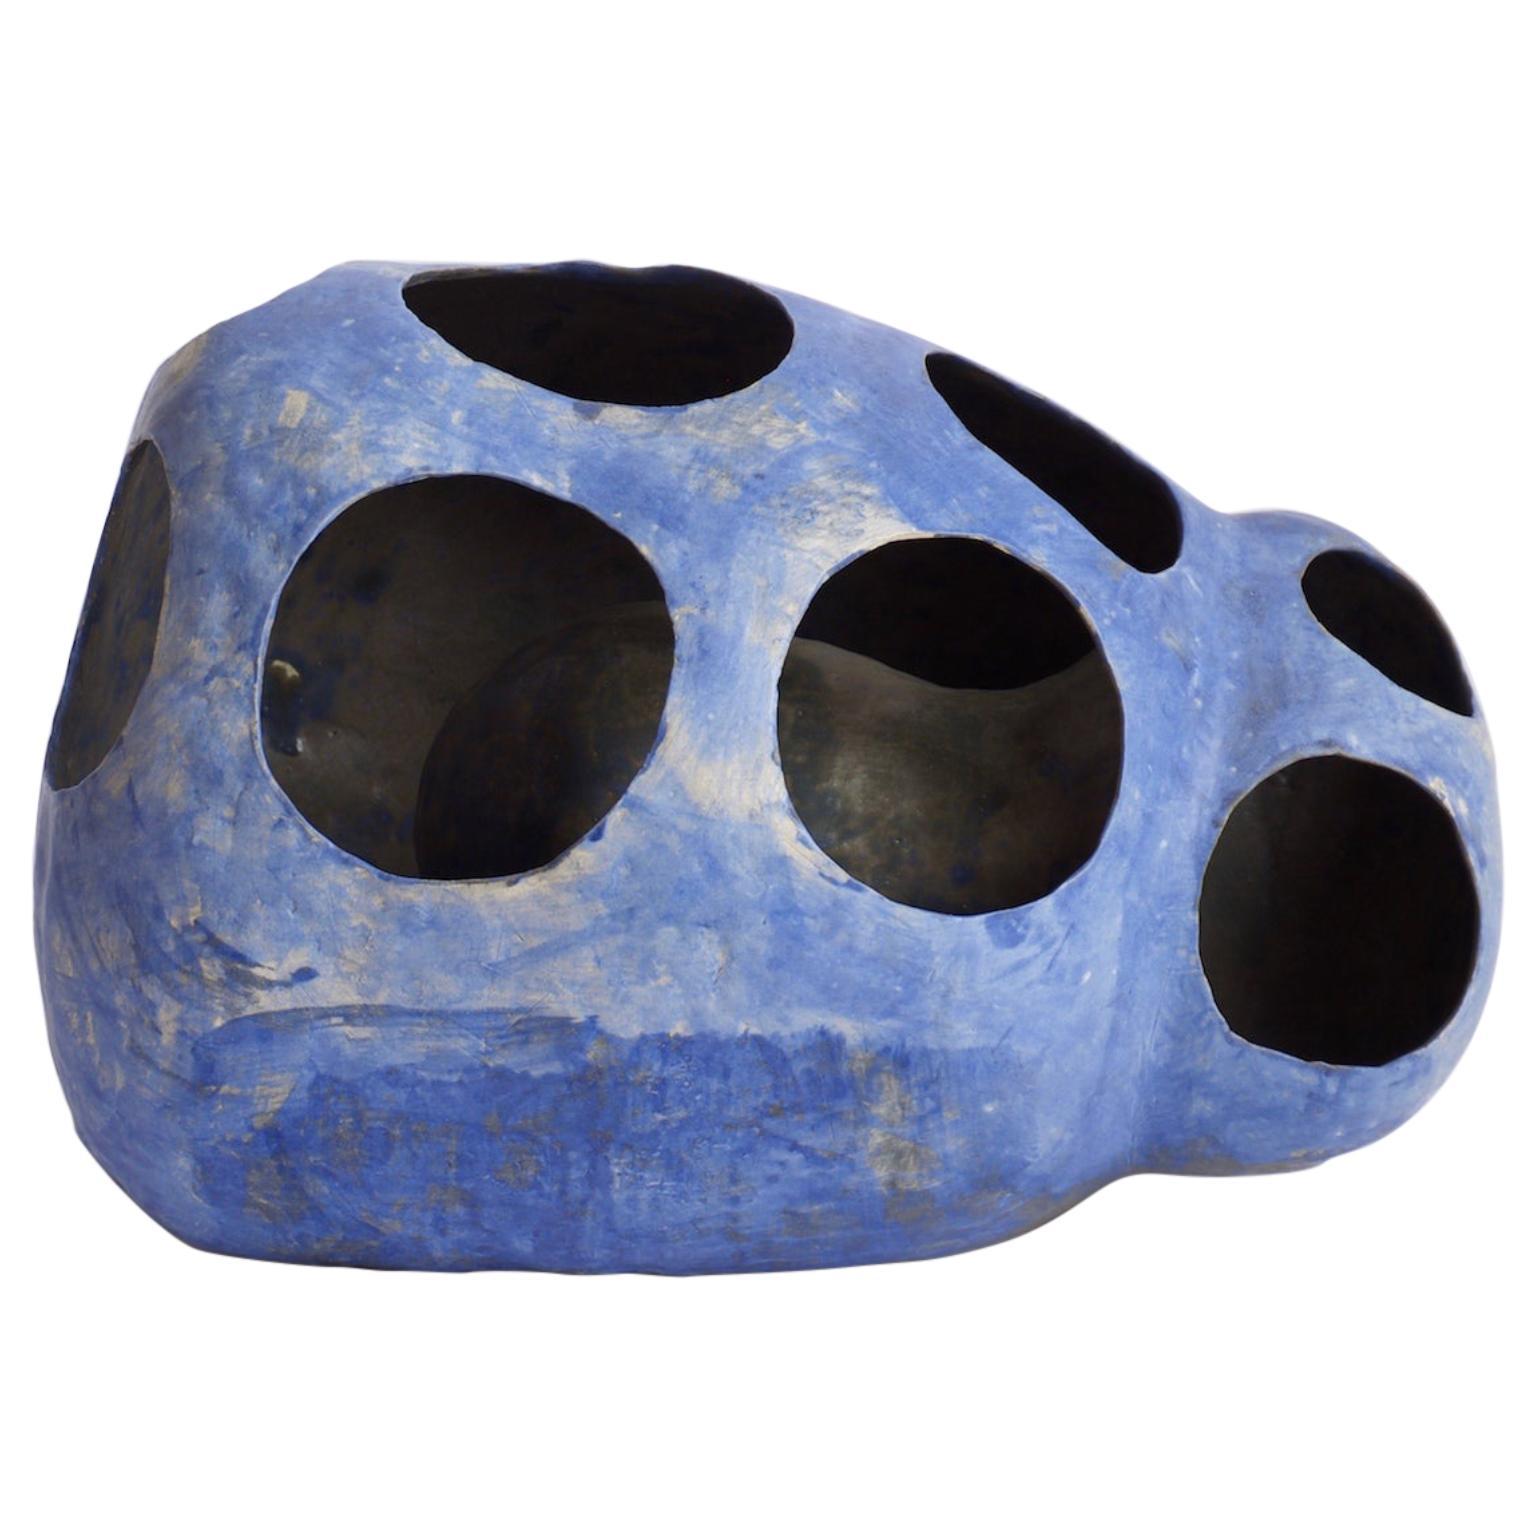 Hand-Built Ceramic Contemporary Sculpture in Cobalt Blue Oxide by Yuko Nishikawa